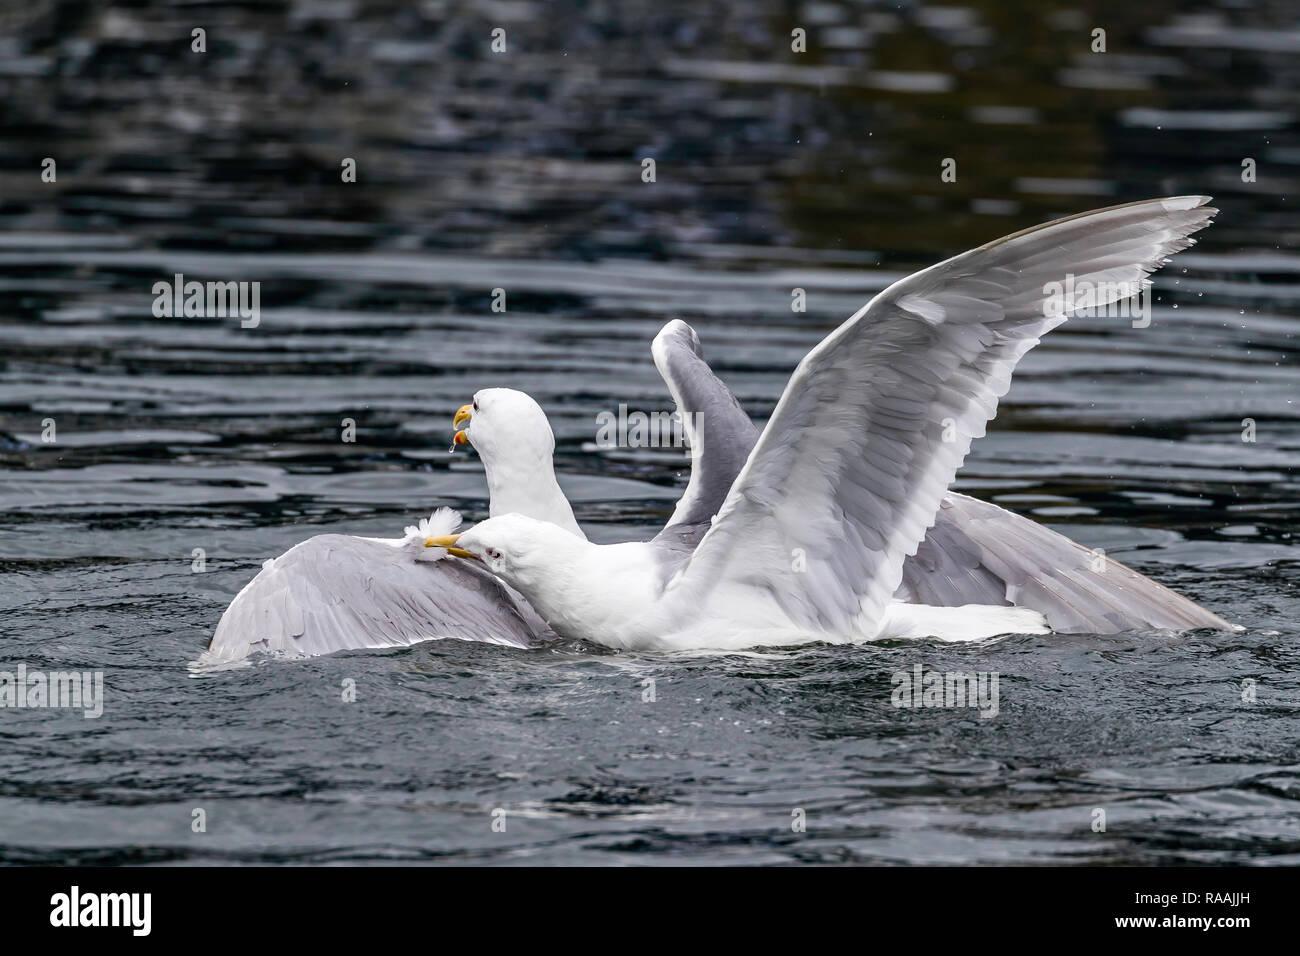 Glaucous-winged gulls, Larus glaucescens, fighting over food near Petersburg, southeast Alaska, USA. - Stock Image